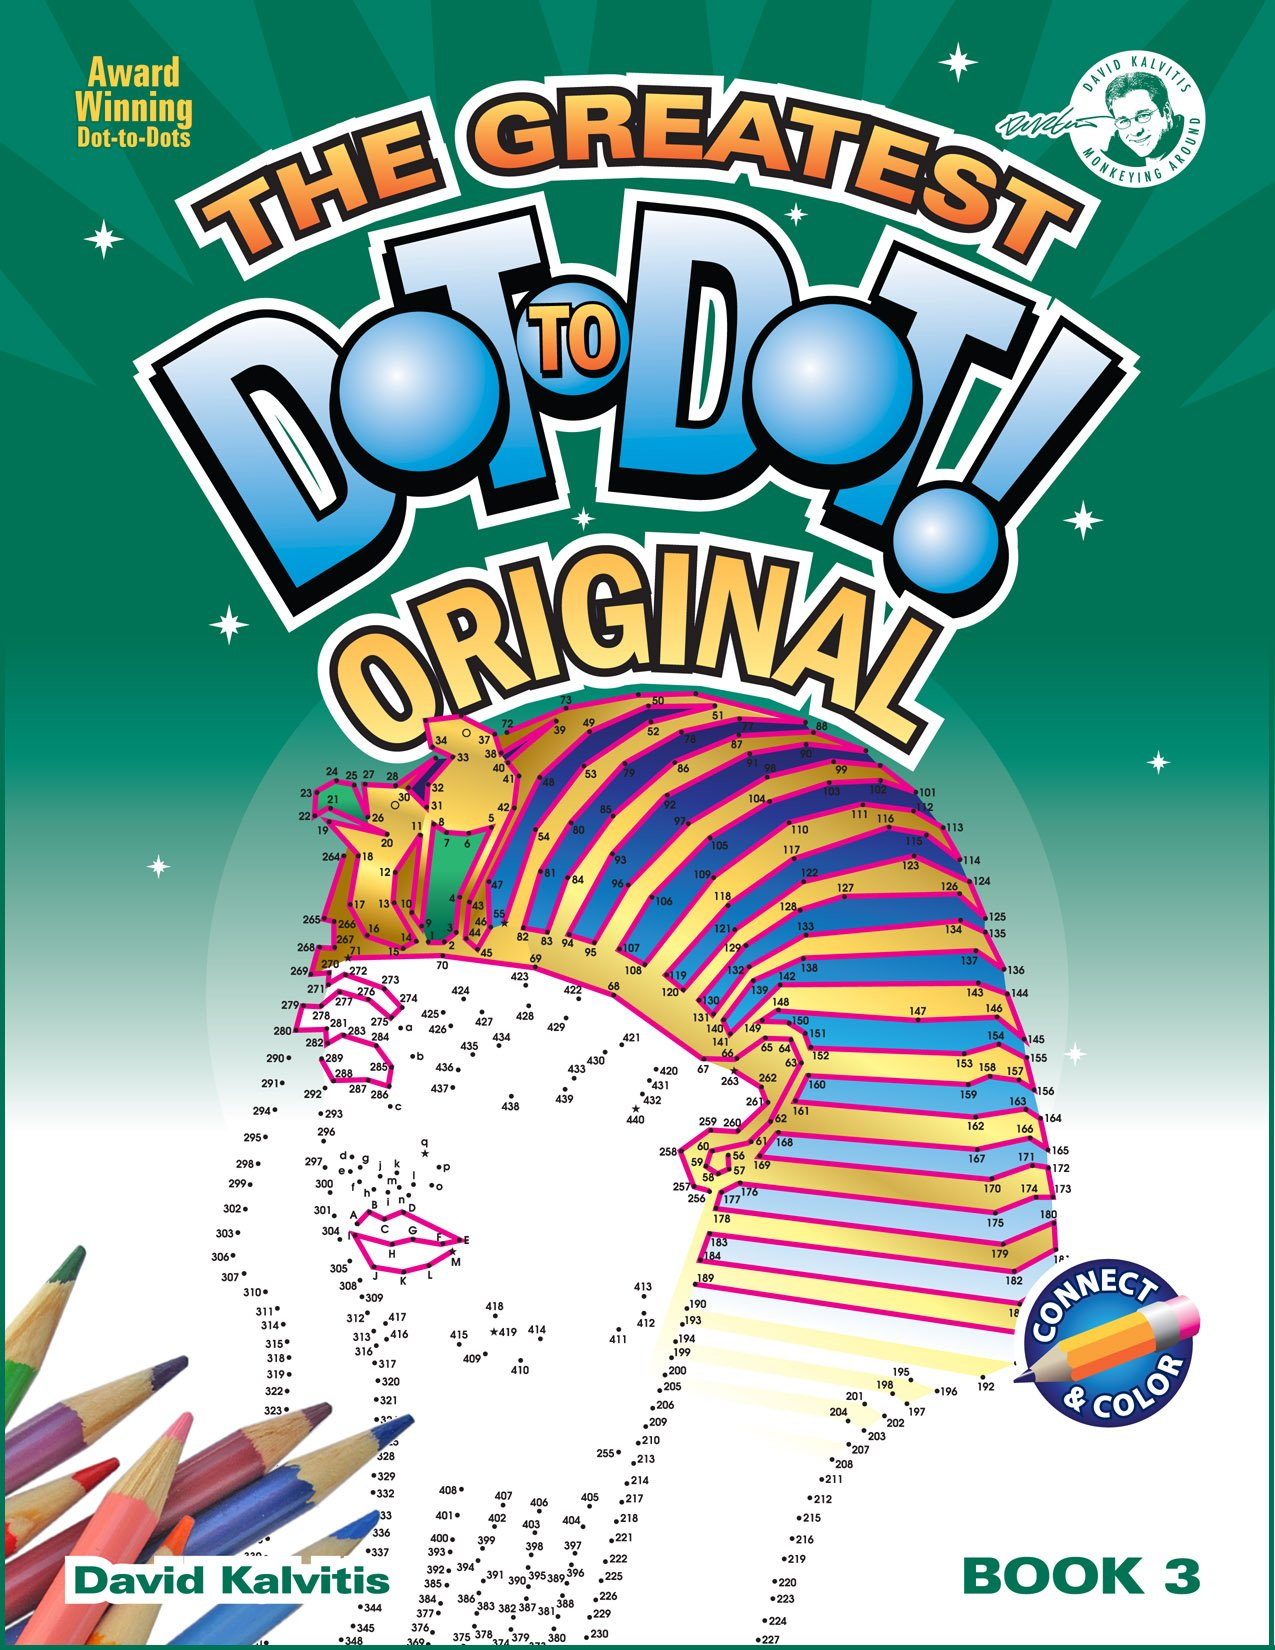 Greatest Dot Dot Book World product image